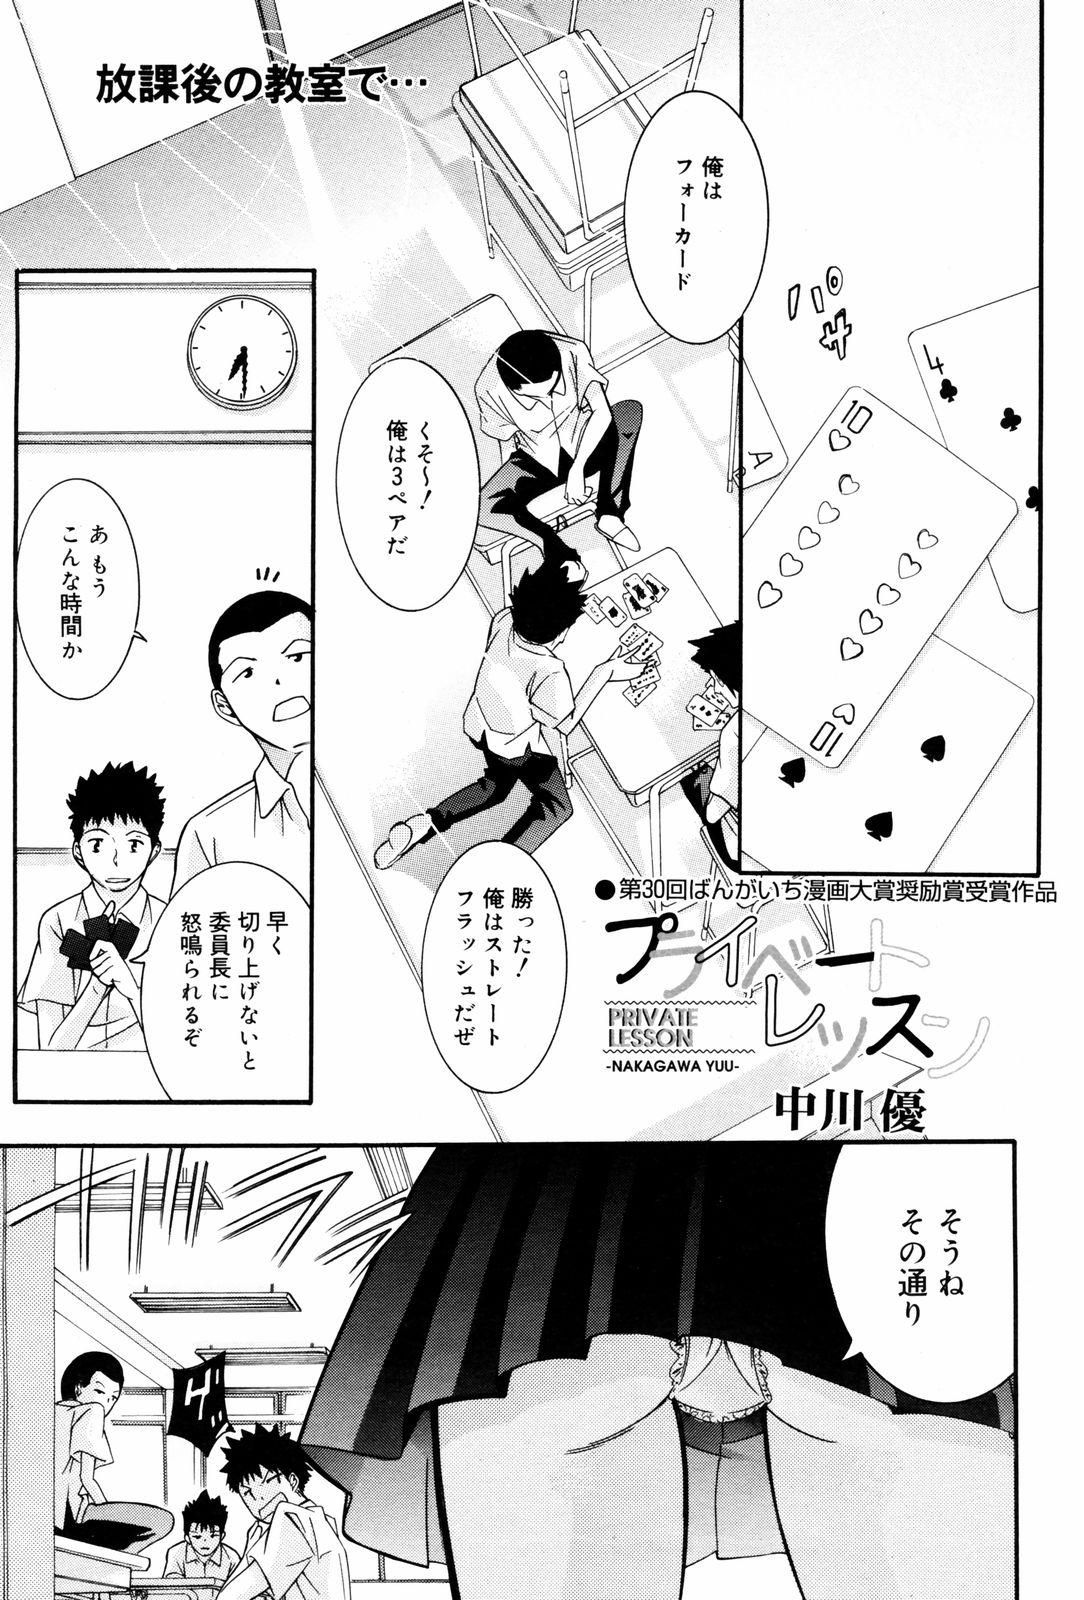 Manga Bangaichi 2008-03 228